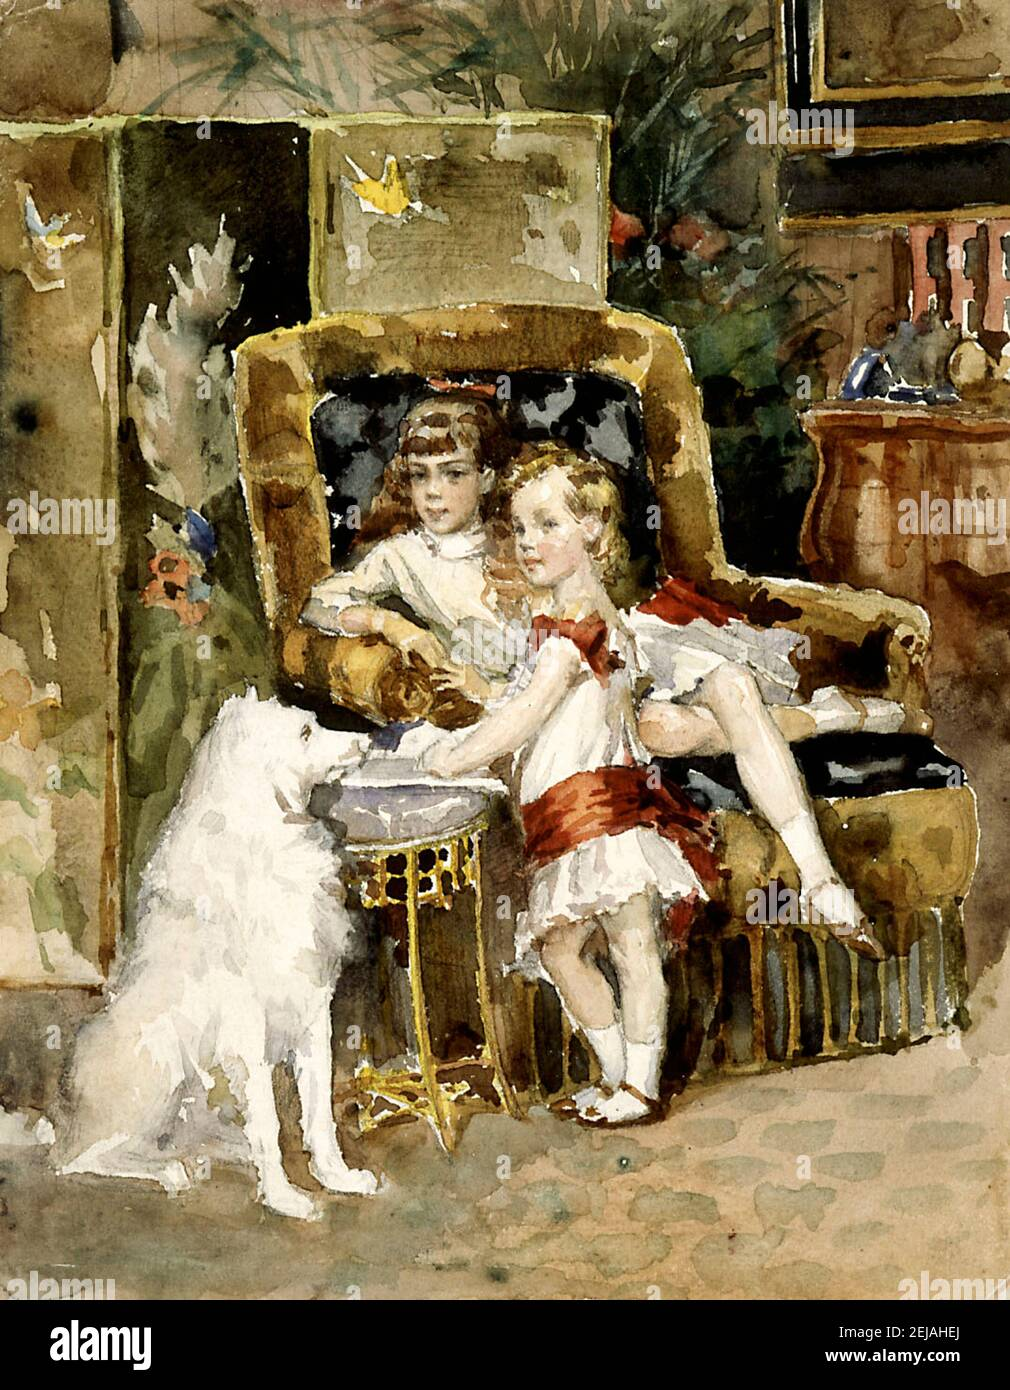 Grand Duke Michael Alexandrovich of Russia (1878-1918) and Grand Duchess Xenia Alexandrovna of Russia (1875-1960). Museum: Ateneum, Helsinki. Author: Albert Gustaf Aristides Edelfelt. Stock Photo